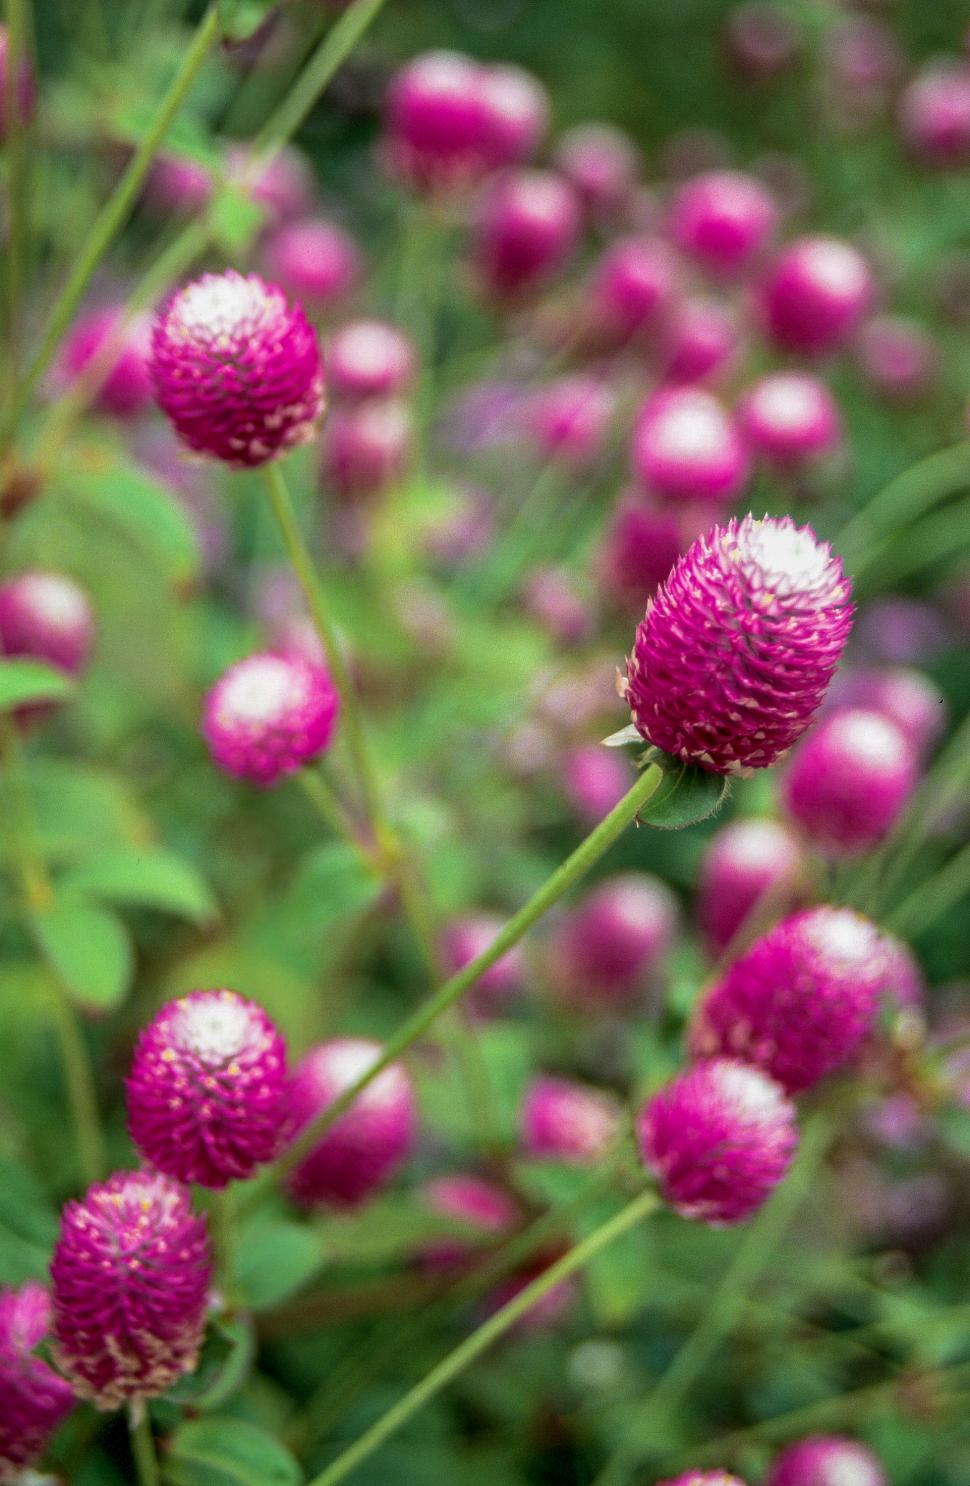 Download Free Stock Photo of Allium sphaerocephalon